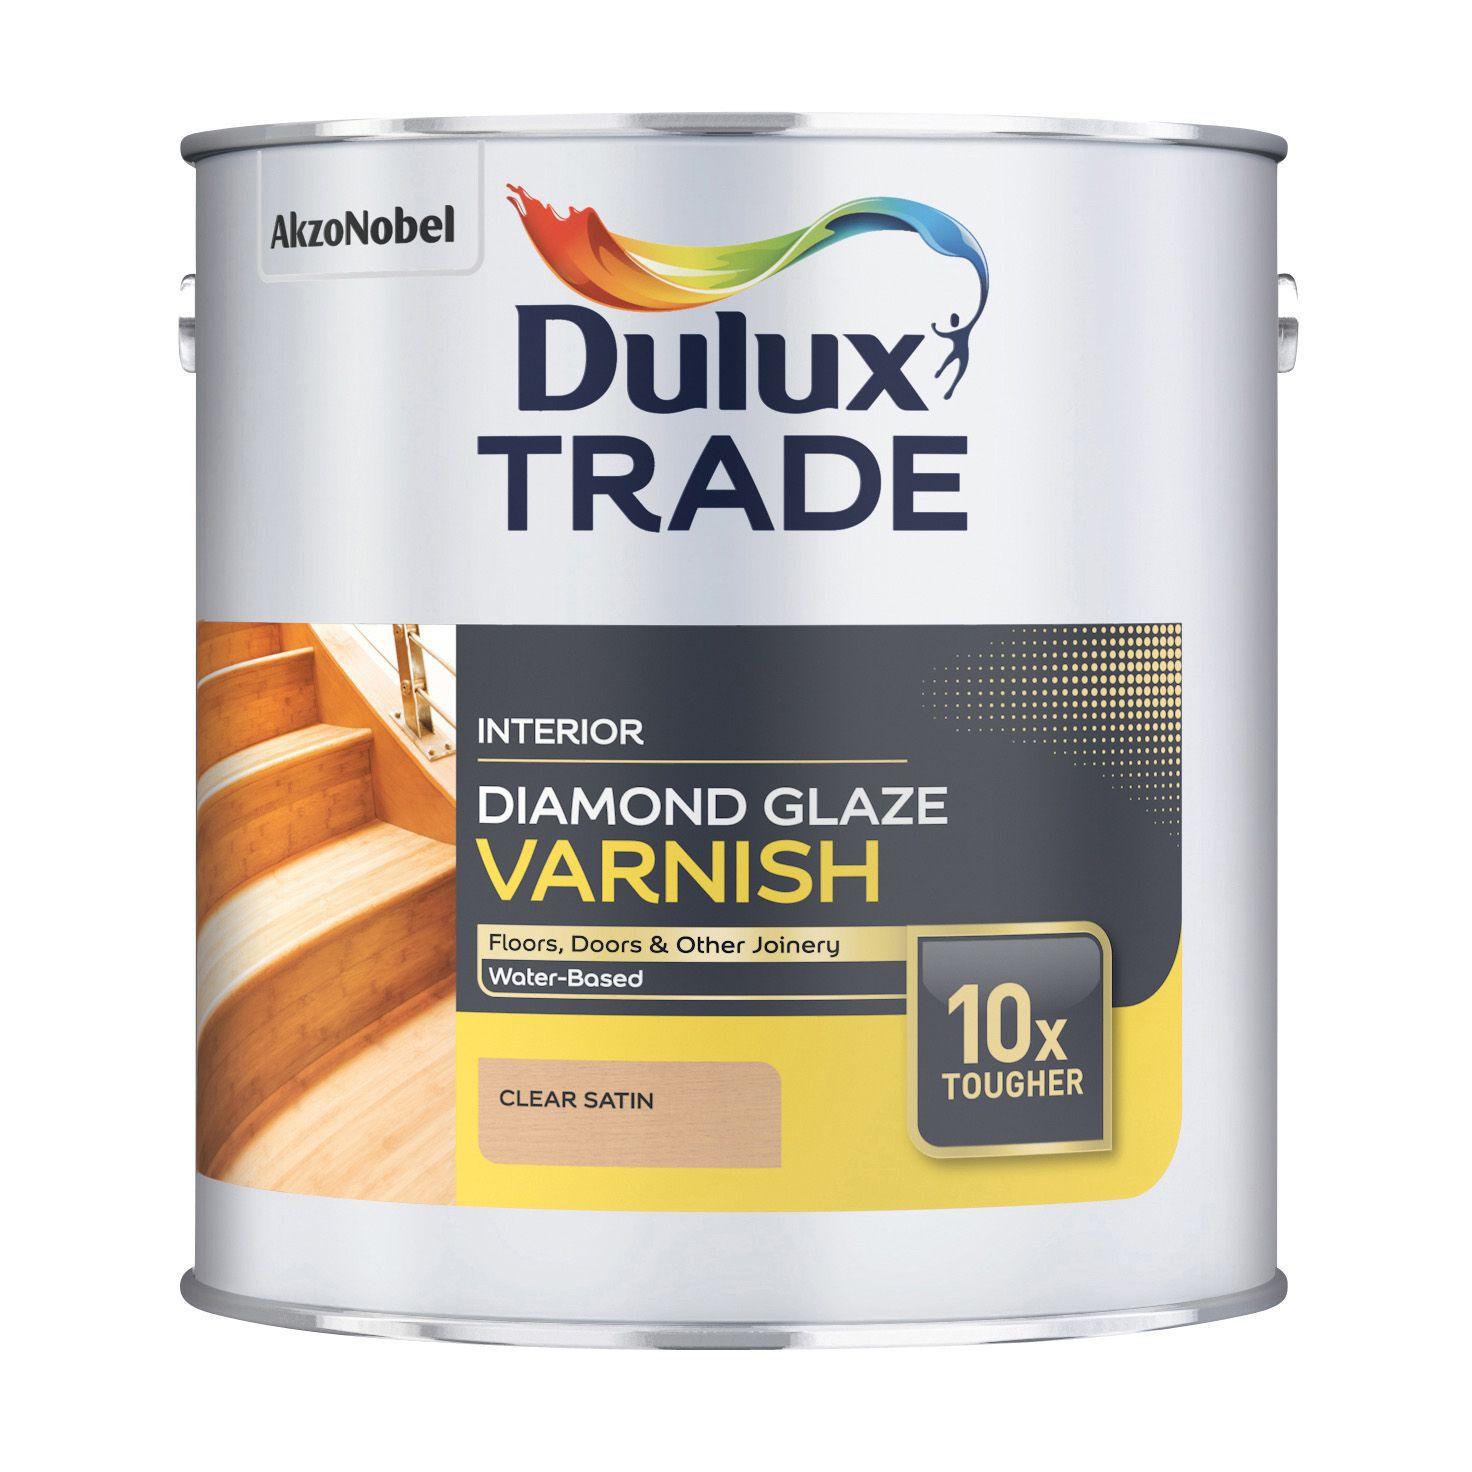 Dulux Trade Clear Satin Varnish 1000ml